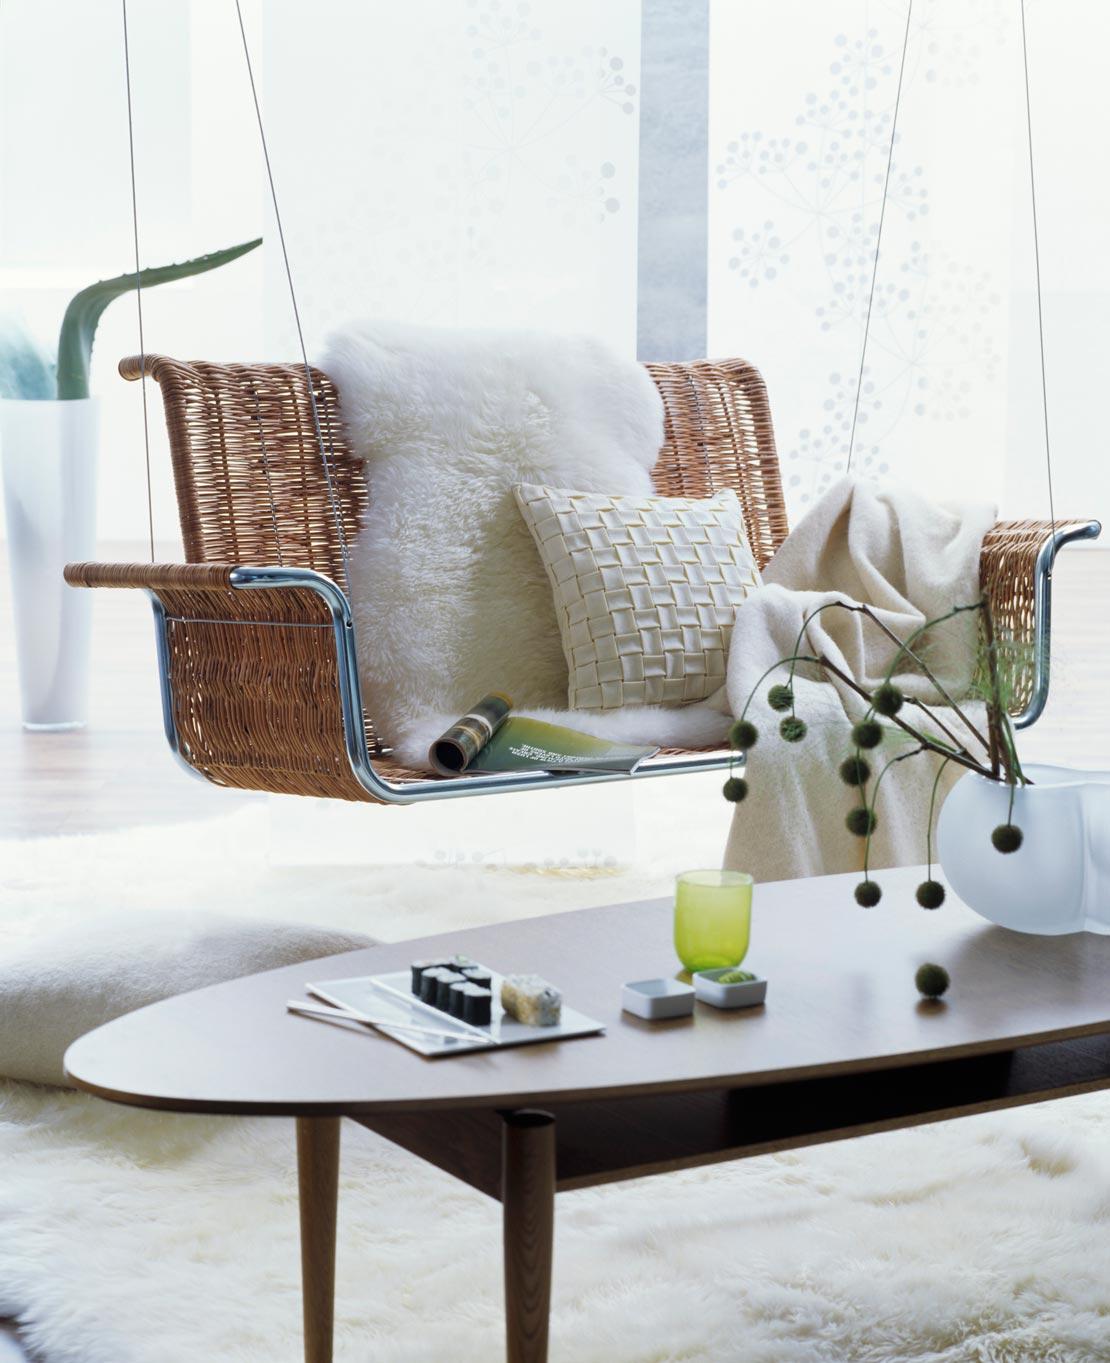 westwing-fauteuil-suspendu